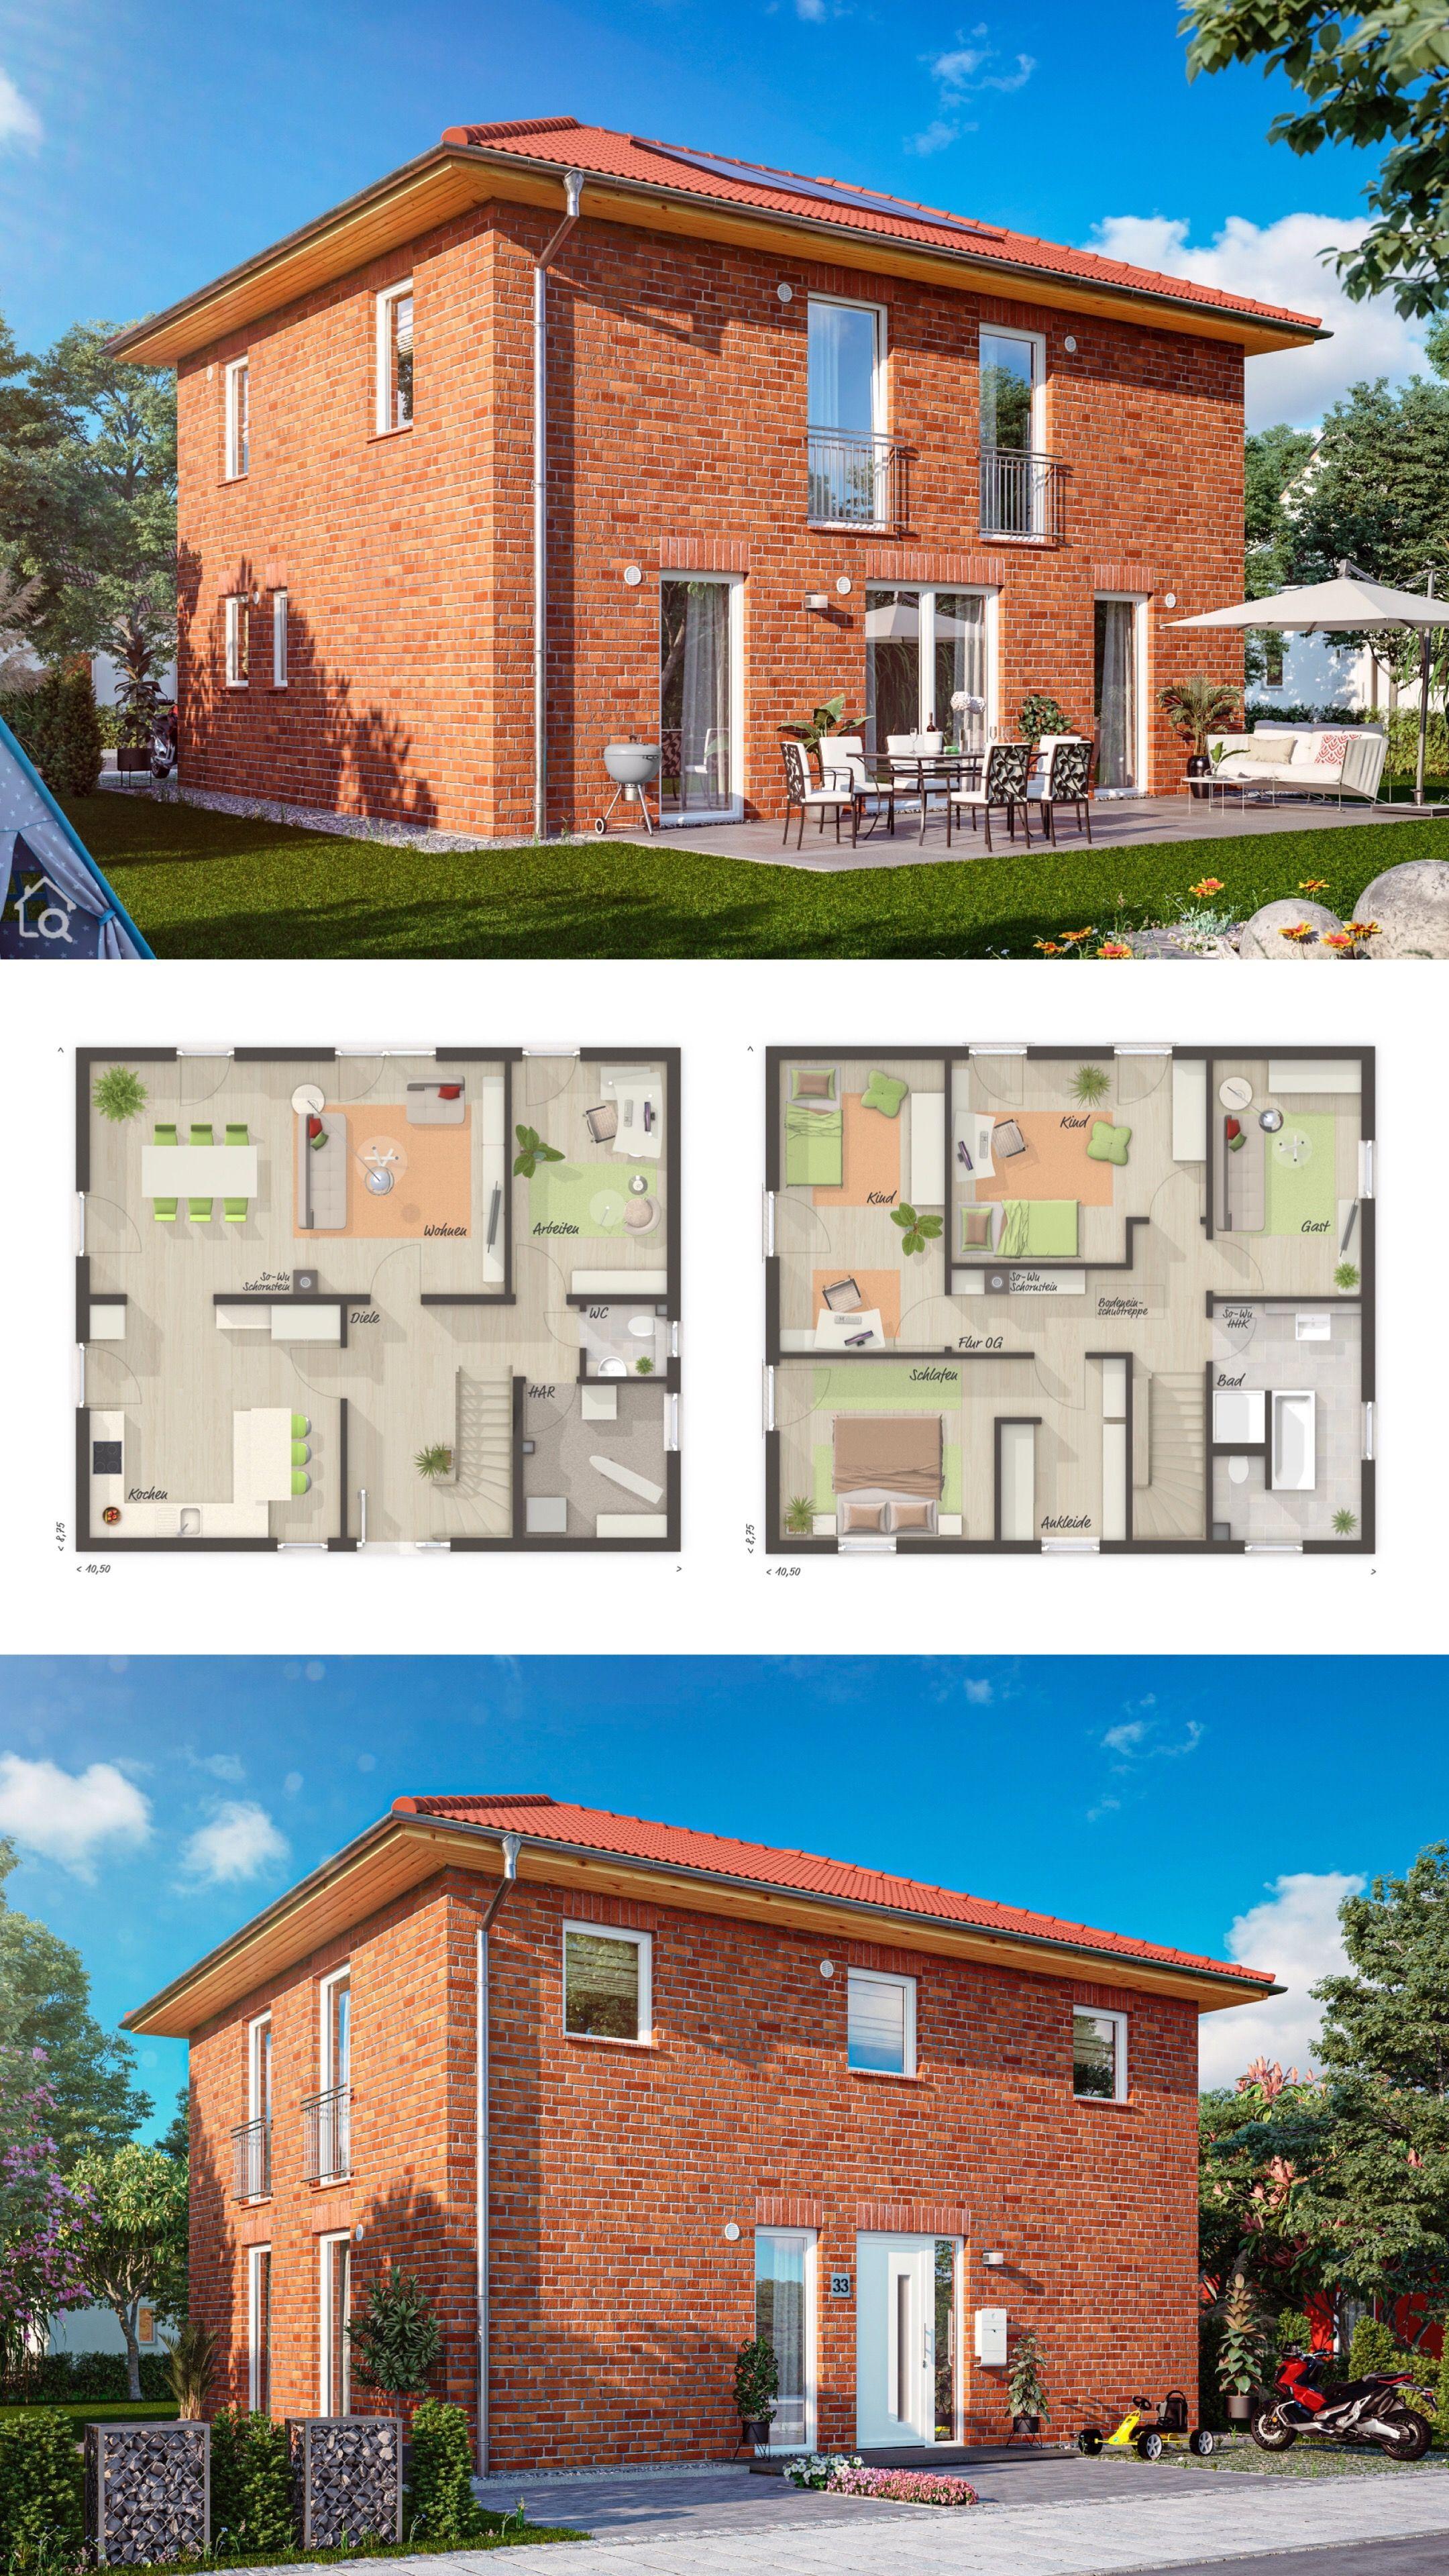 Neubau Stadtvilla mit Klinker Fassade & Walmdach